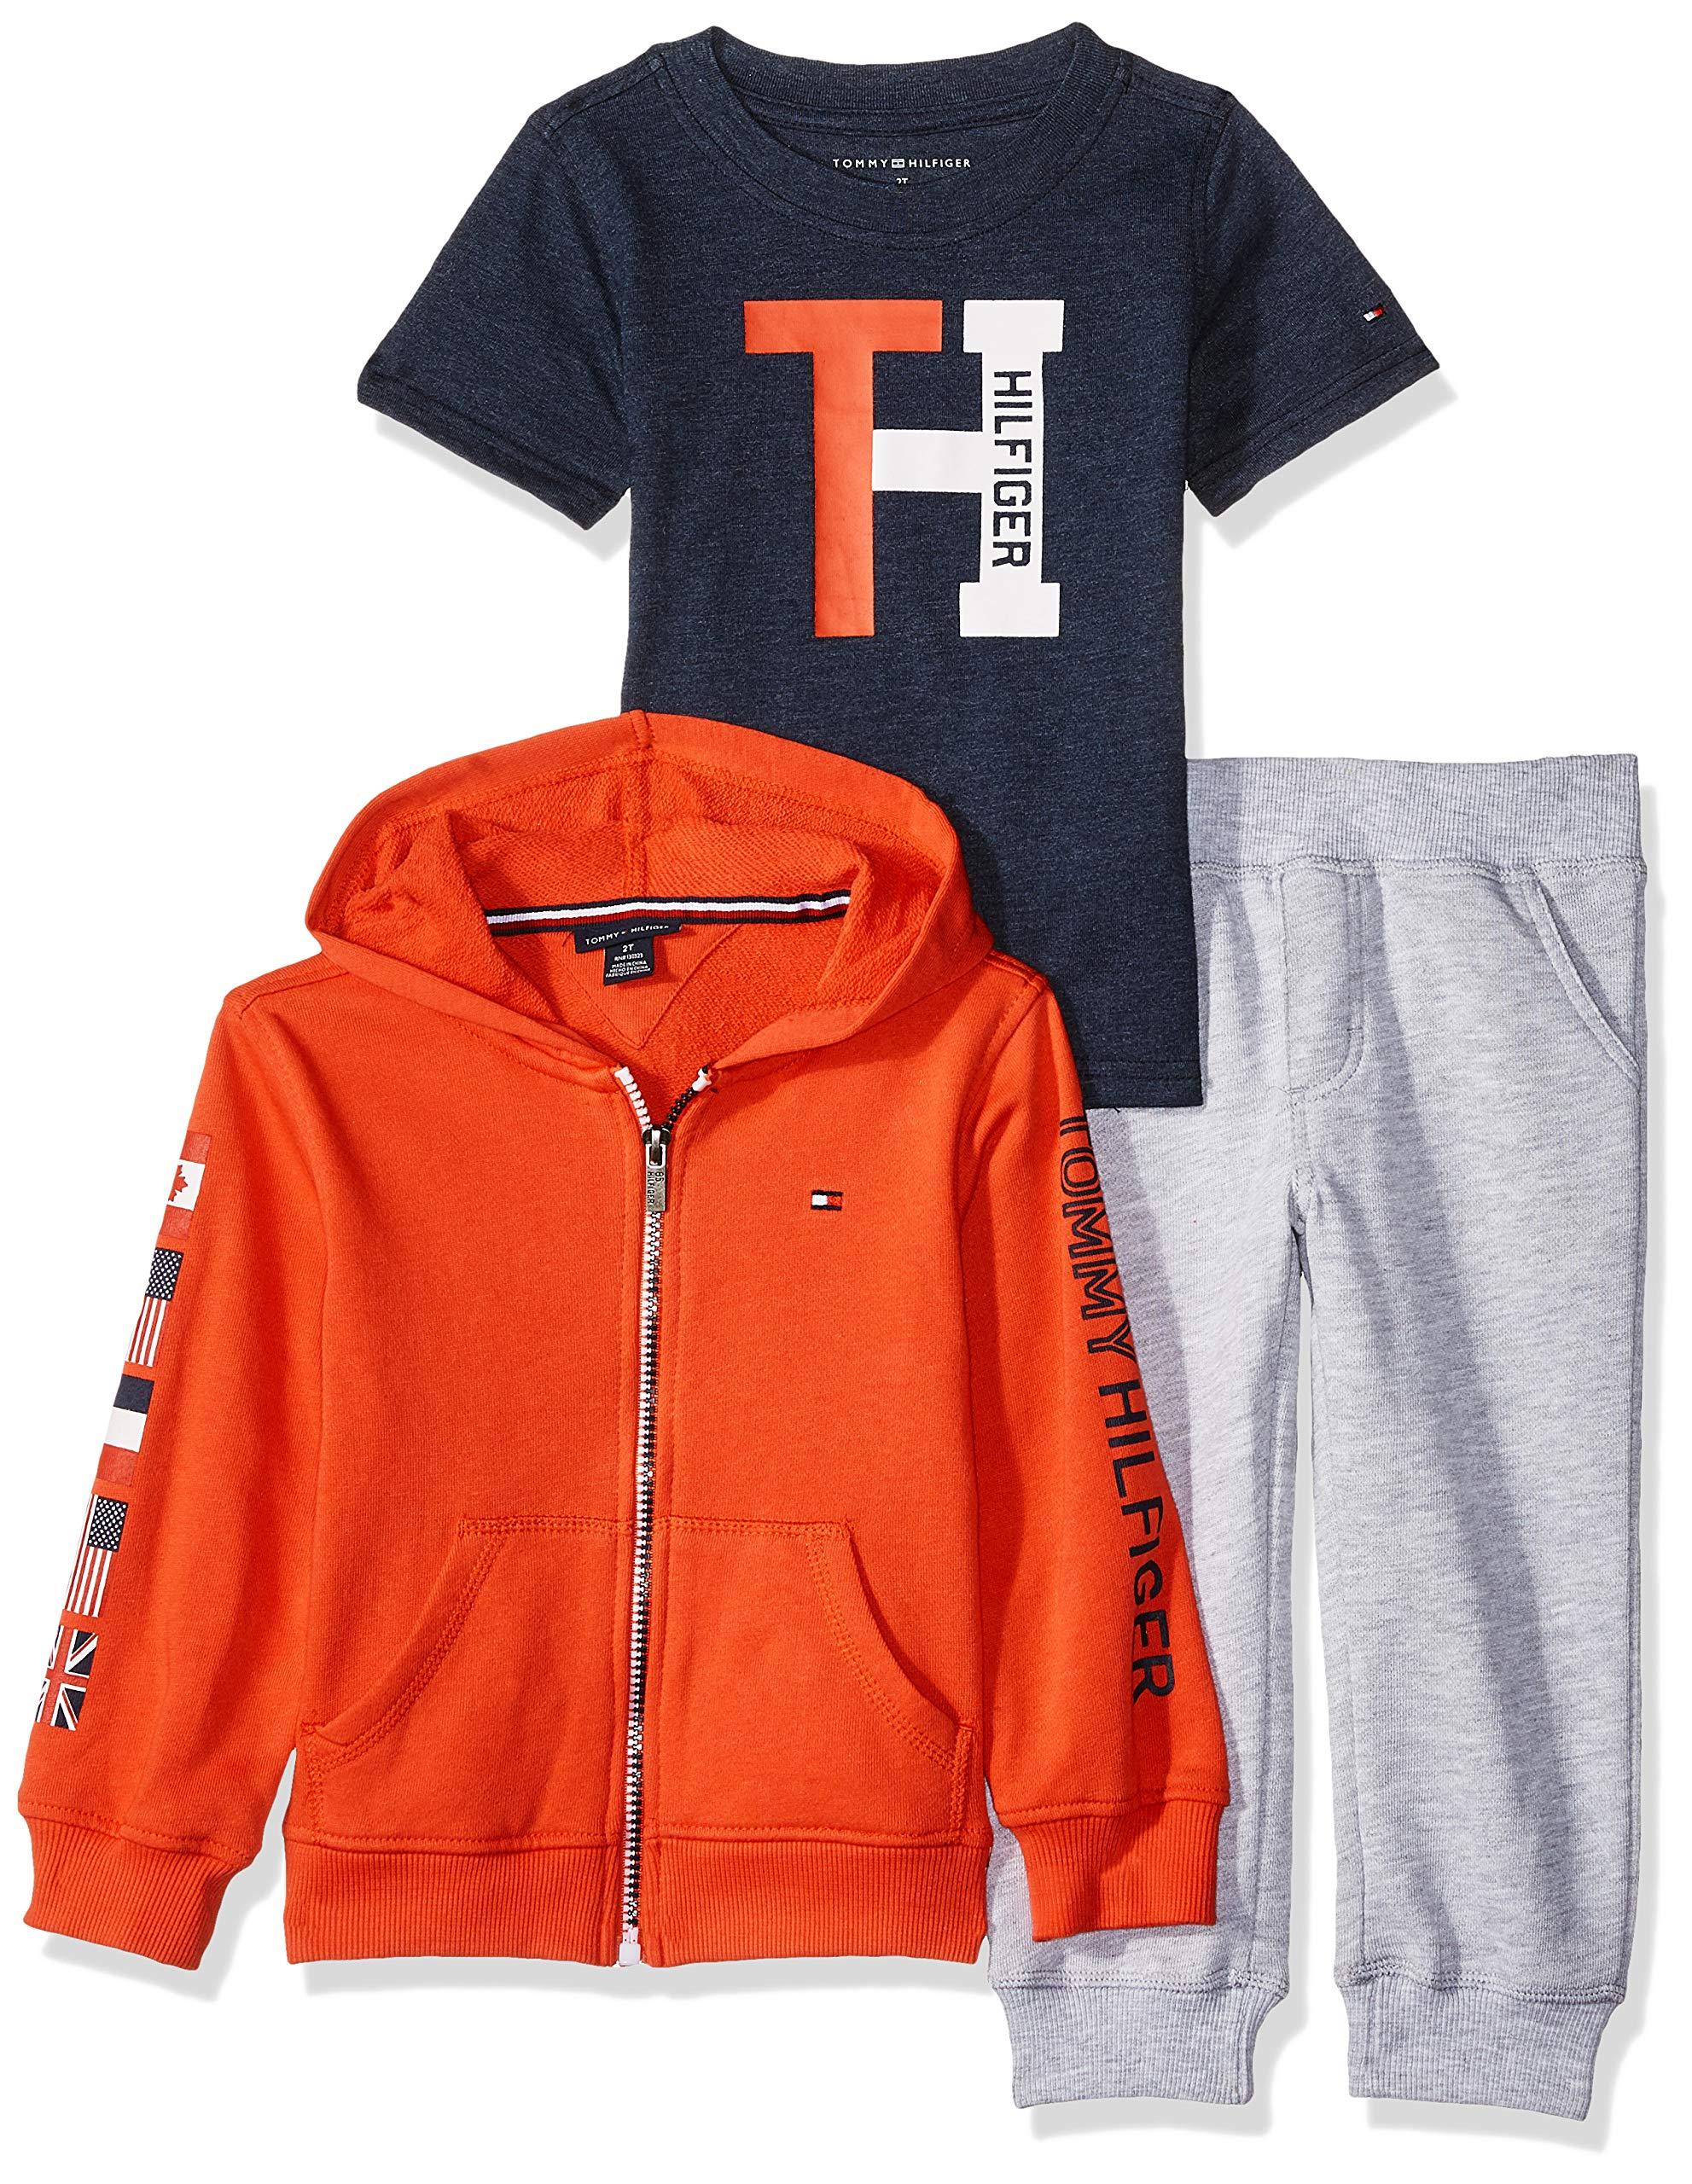 Tommy Hilfiger Boys' Toddler 3 Pieces Jog Set, red/Blue/Gray 3T